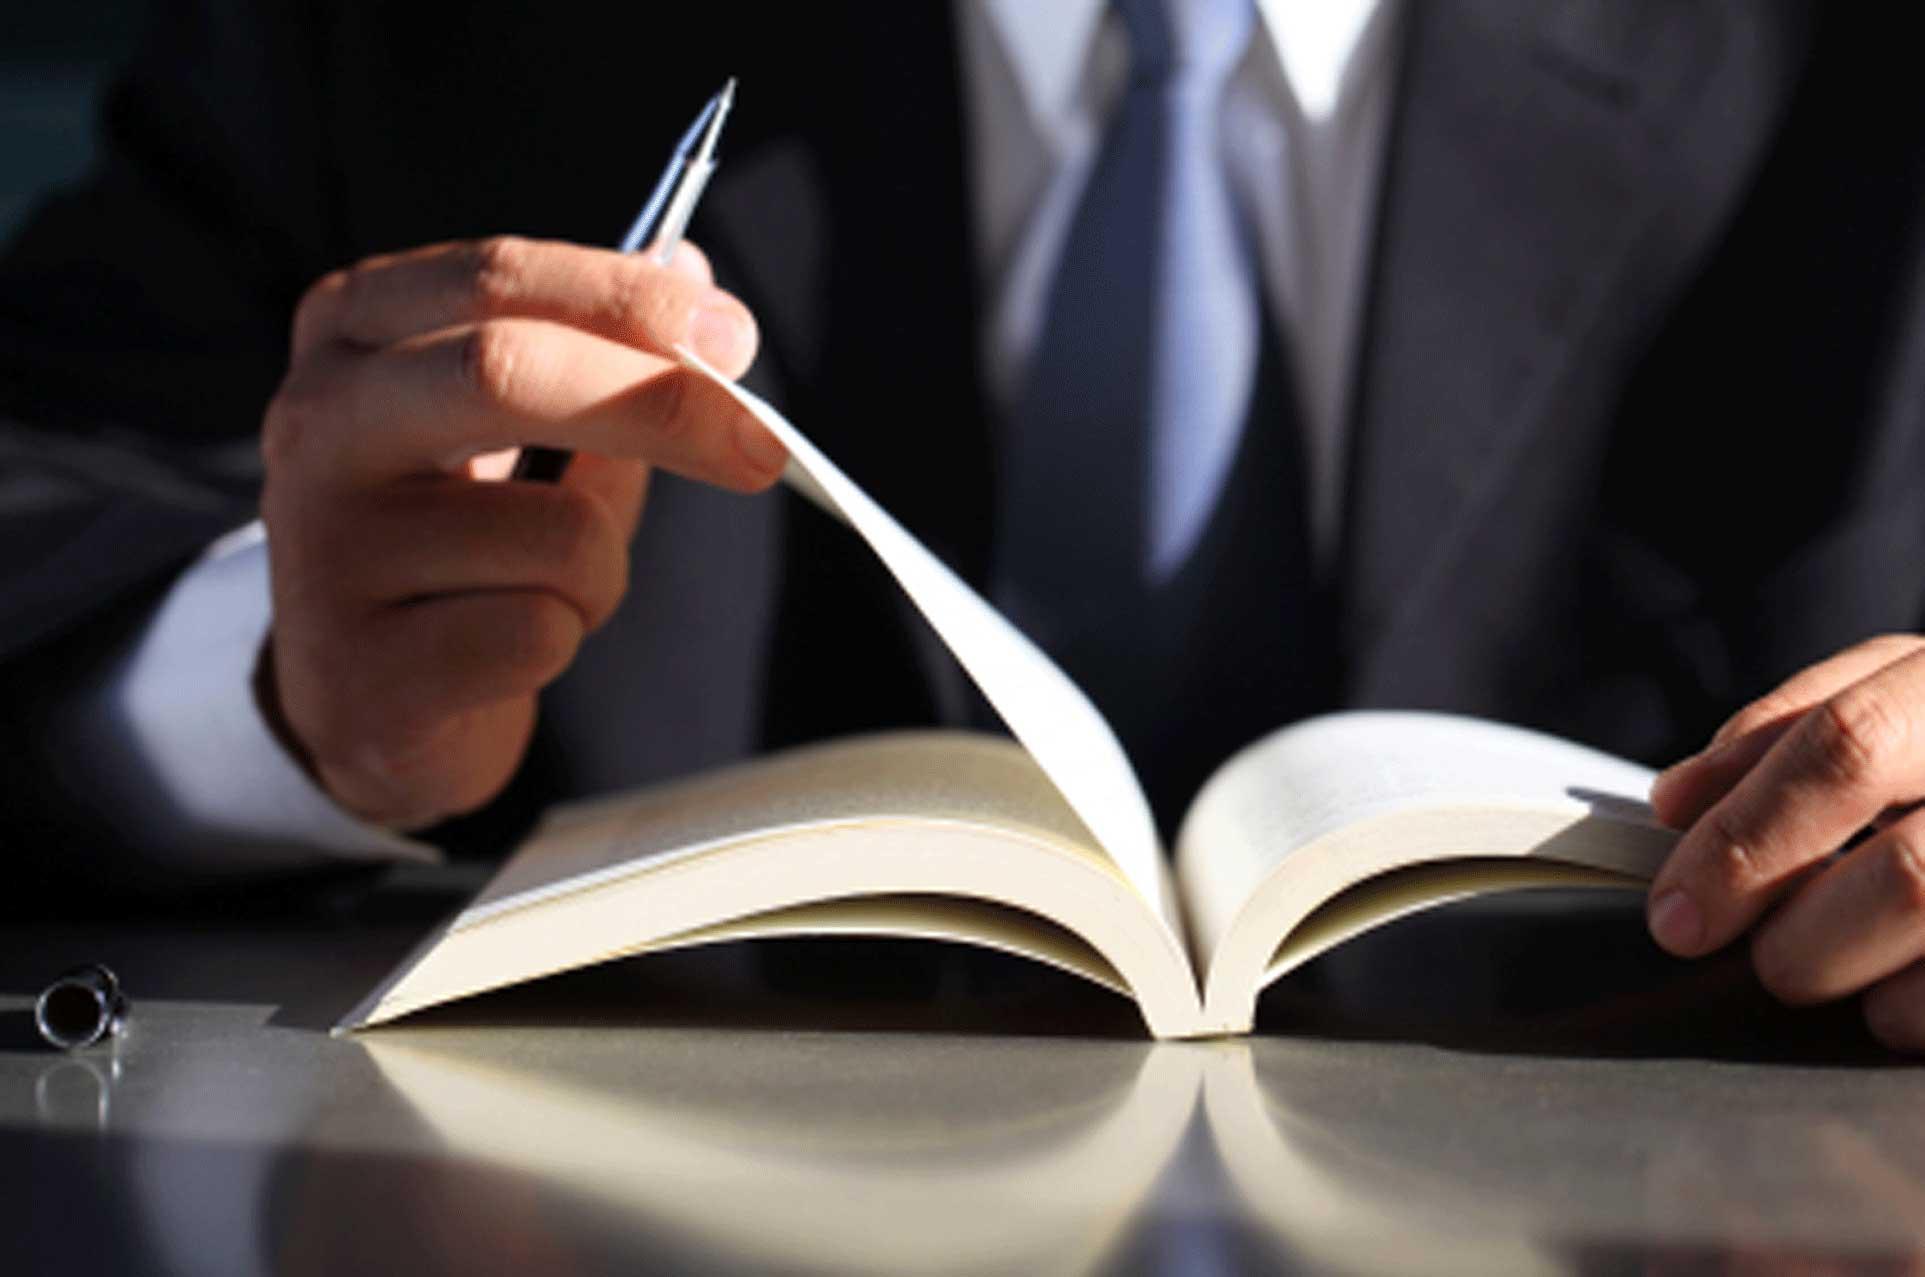 Florida Divorce Guide Information Orlando Divorce Attorney Orange County Divorce Lawyer Seminole County Divorce Attorneys Osceola County Lawyers